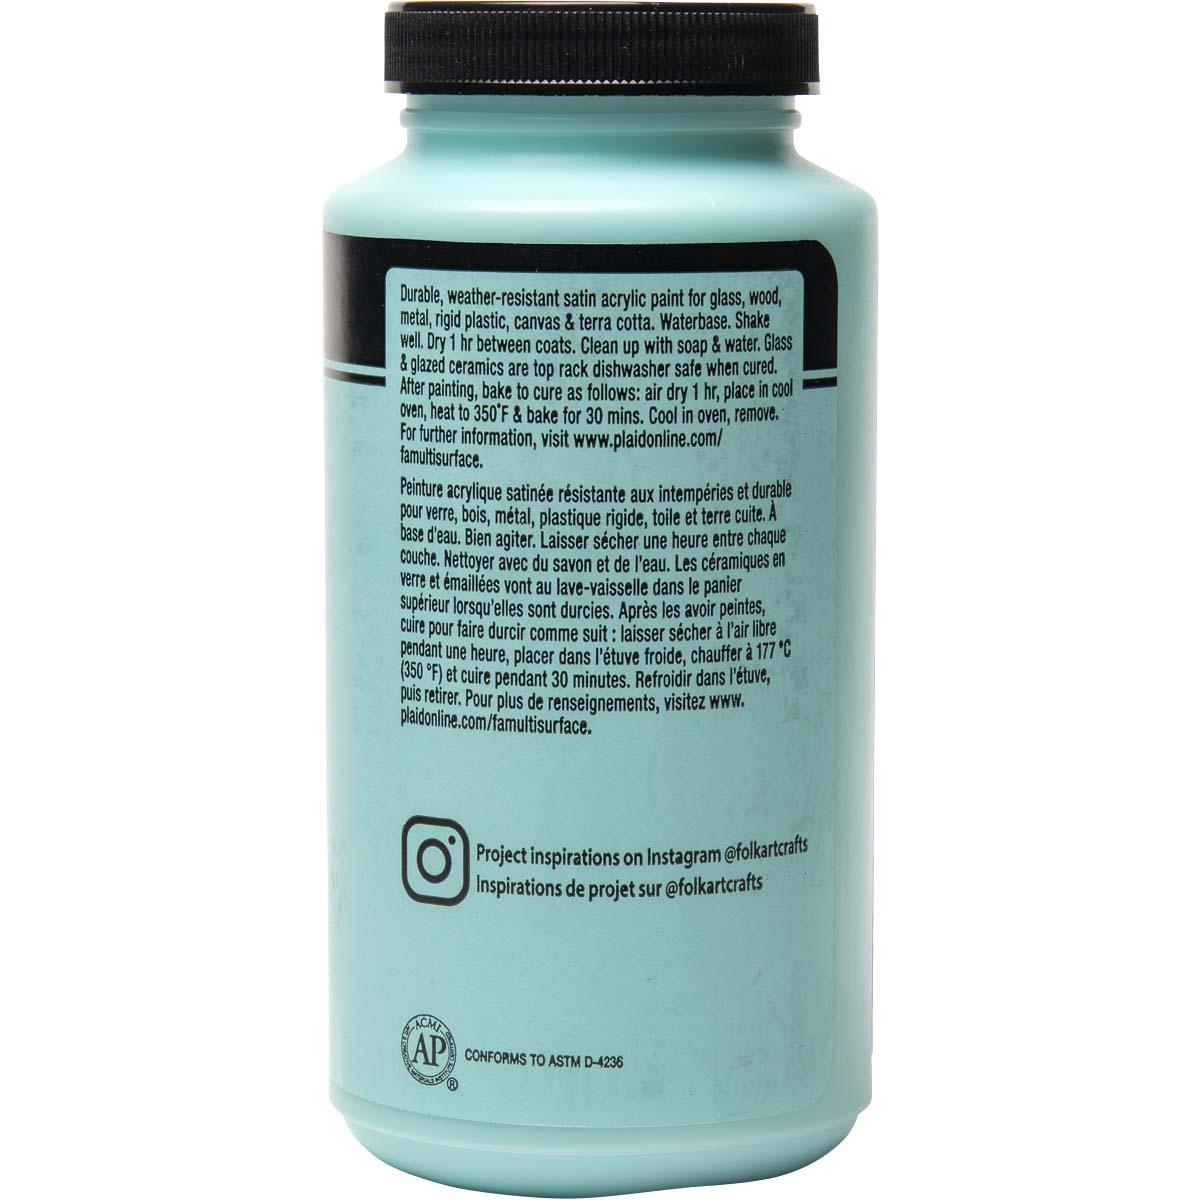 FolkArt ® Multi-Surface Satin Acrylic Paints - Patina, 16 oz. - 6379